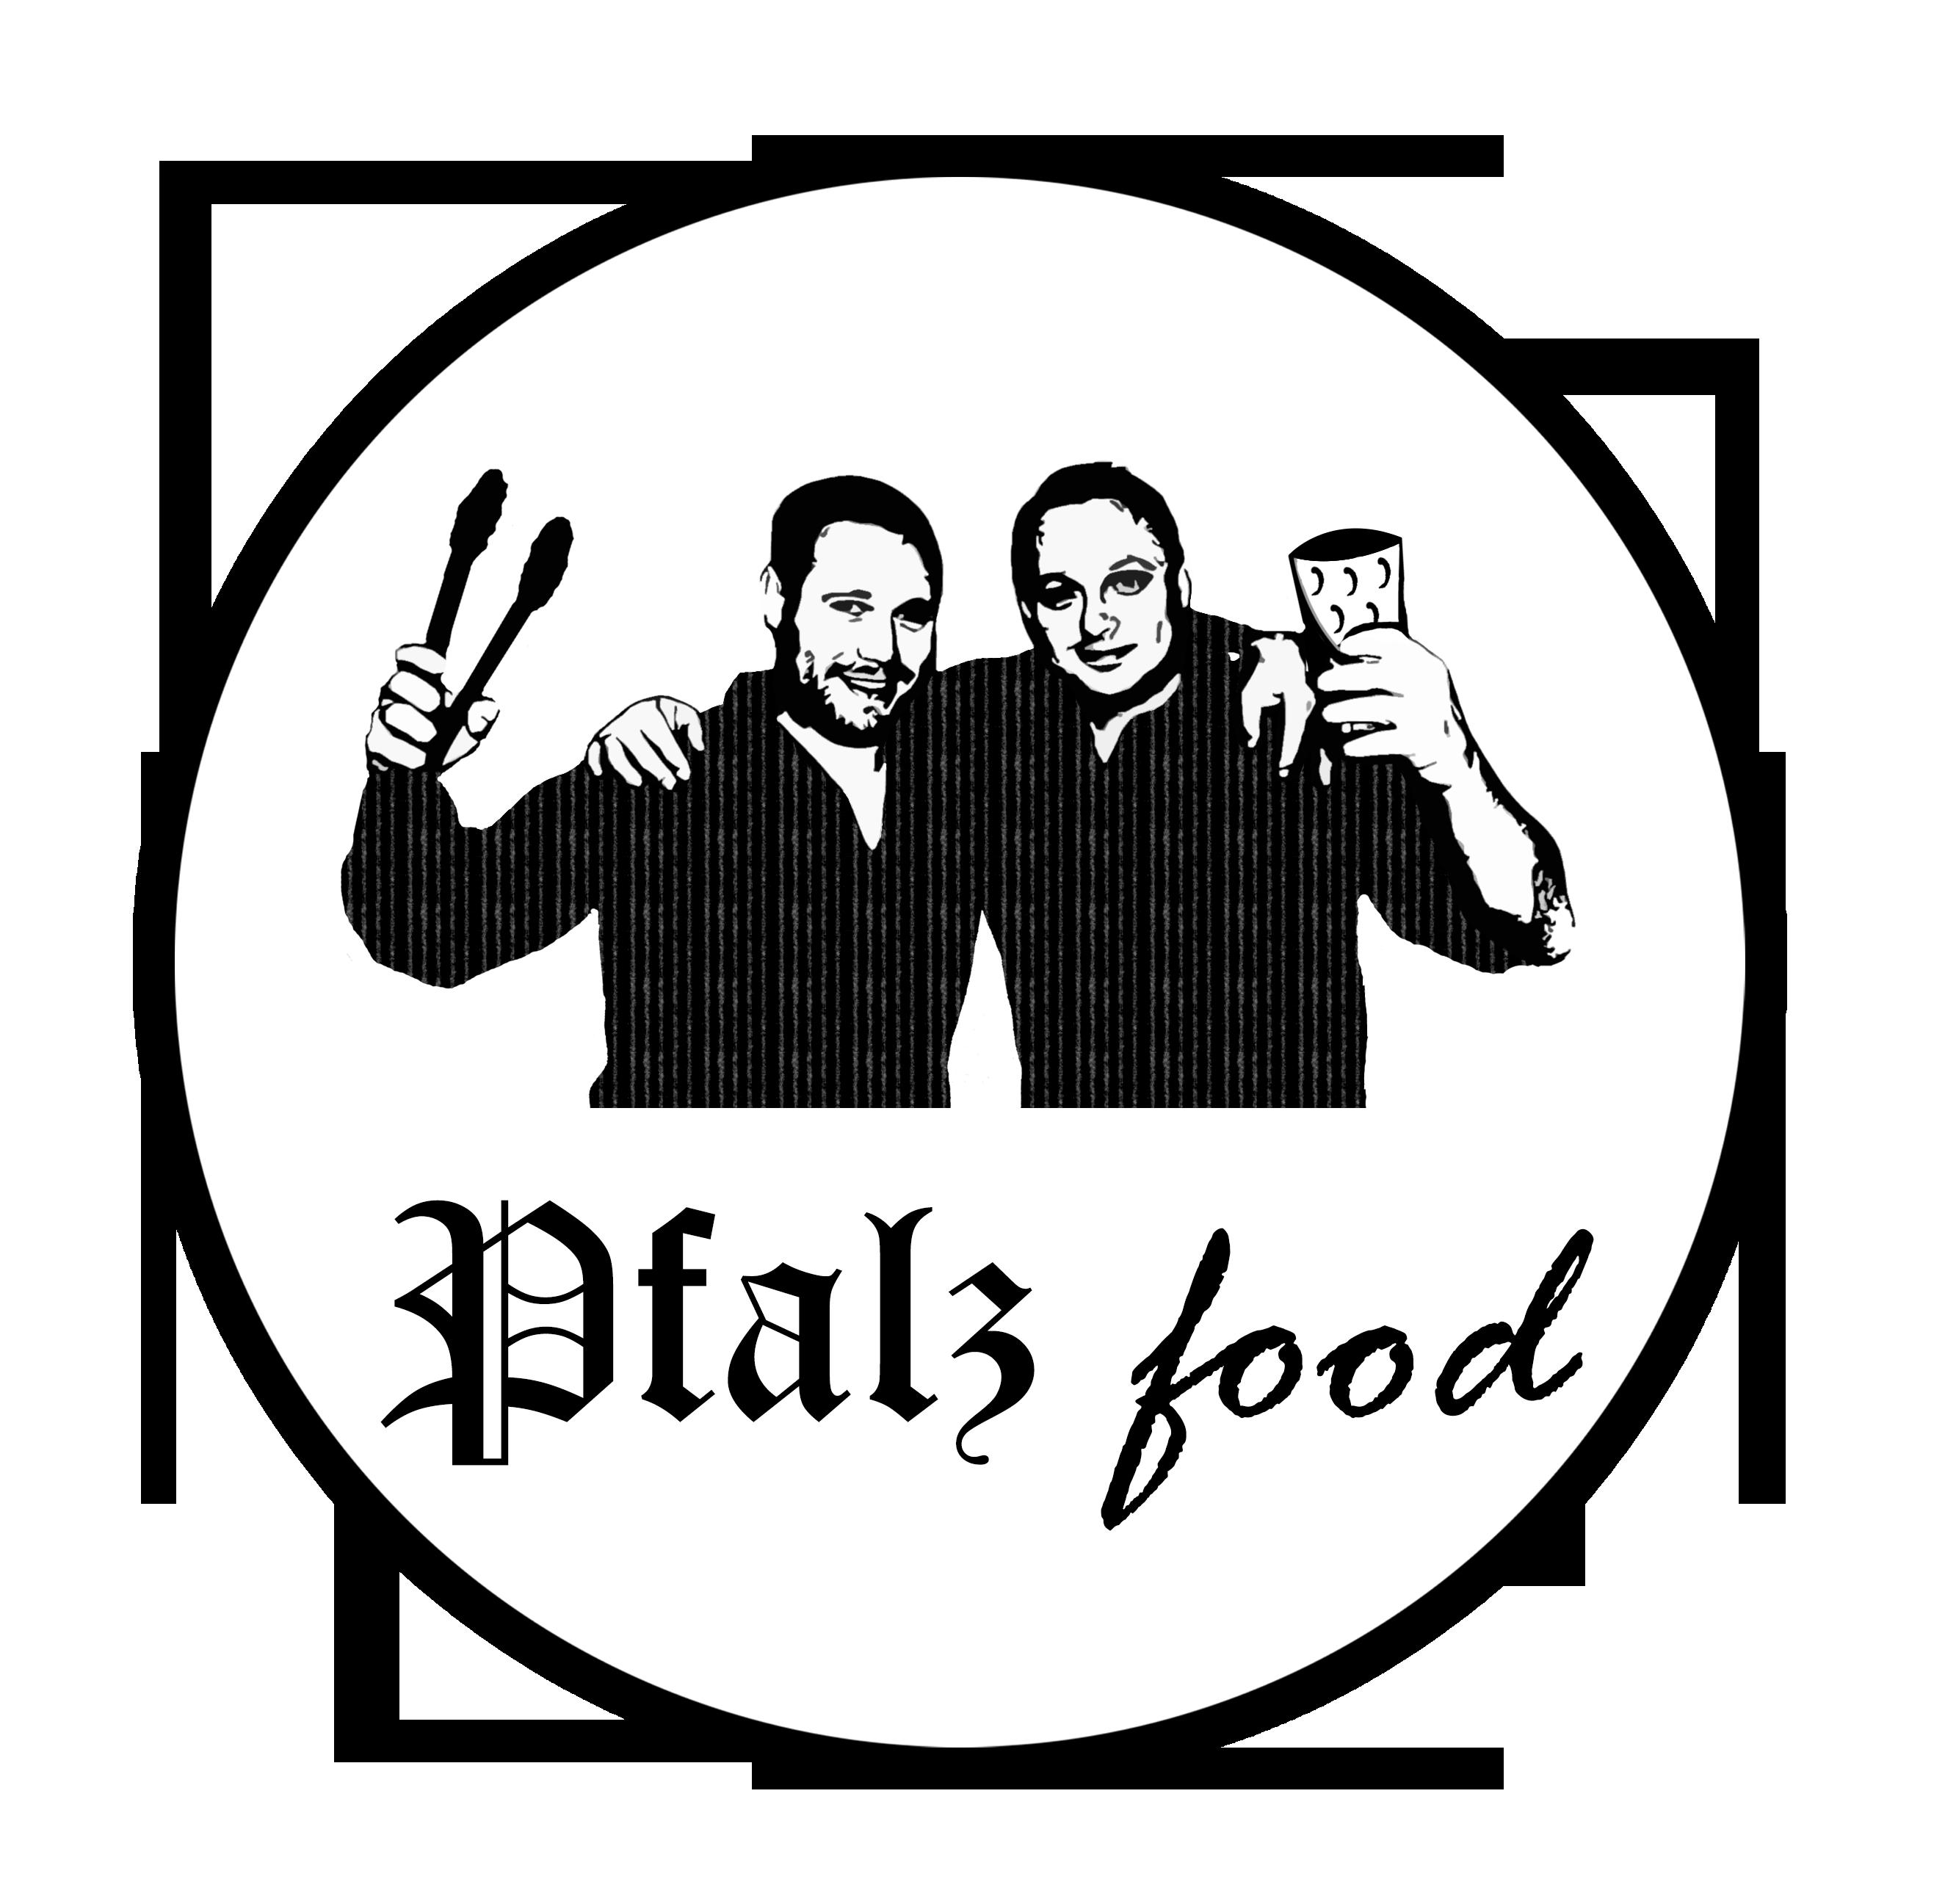 pfalzfood